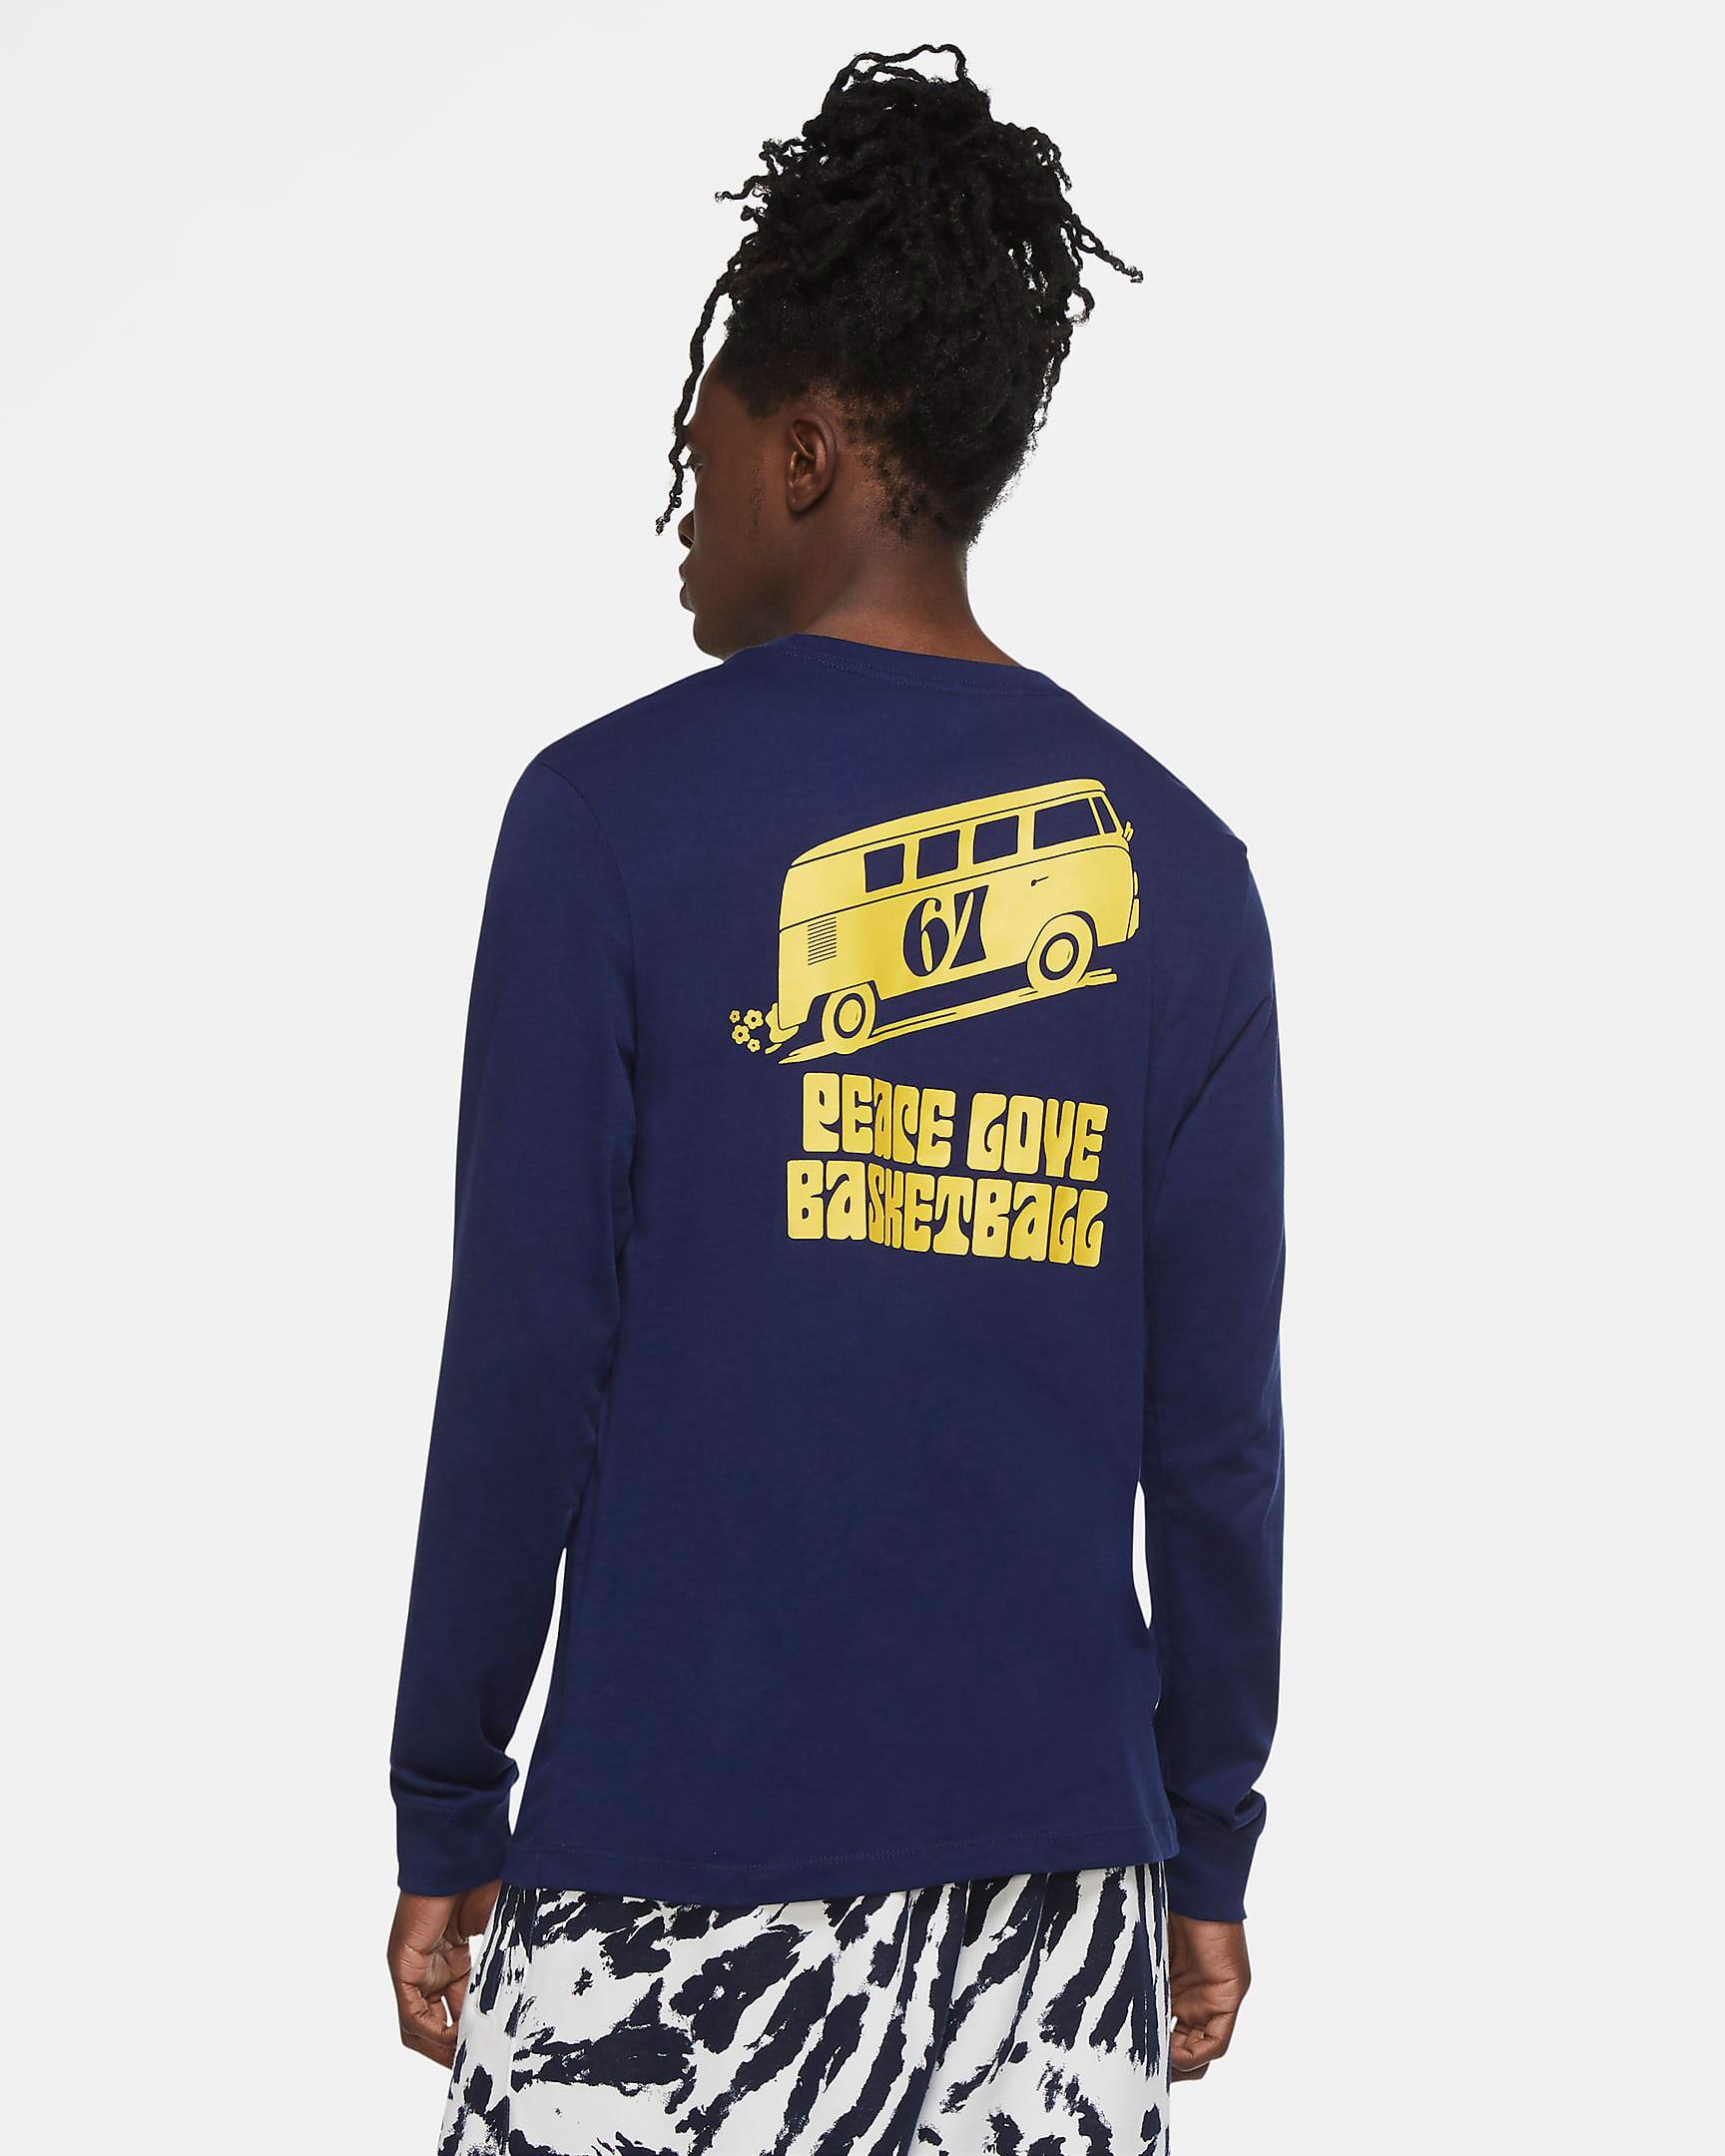 nike-peace-love-basketball-long-sleeve-shirt-navy-2